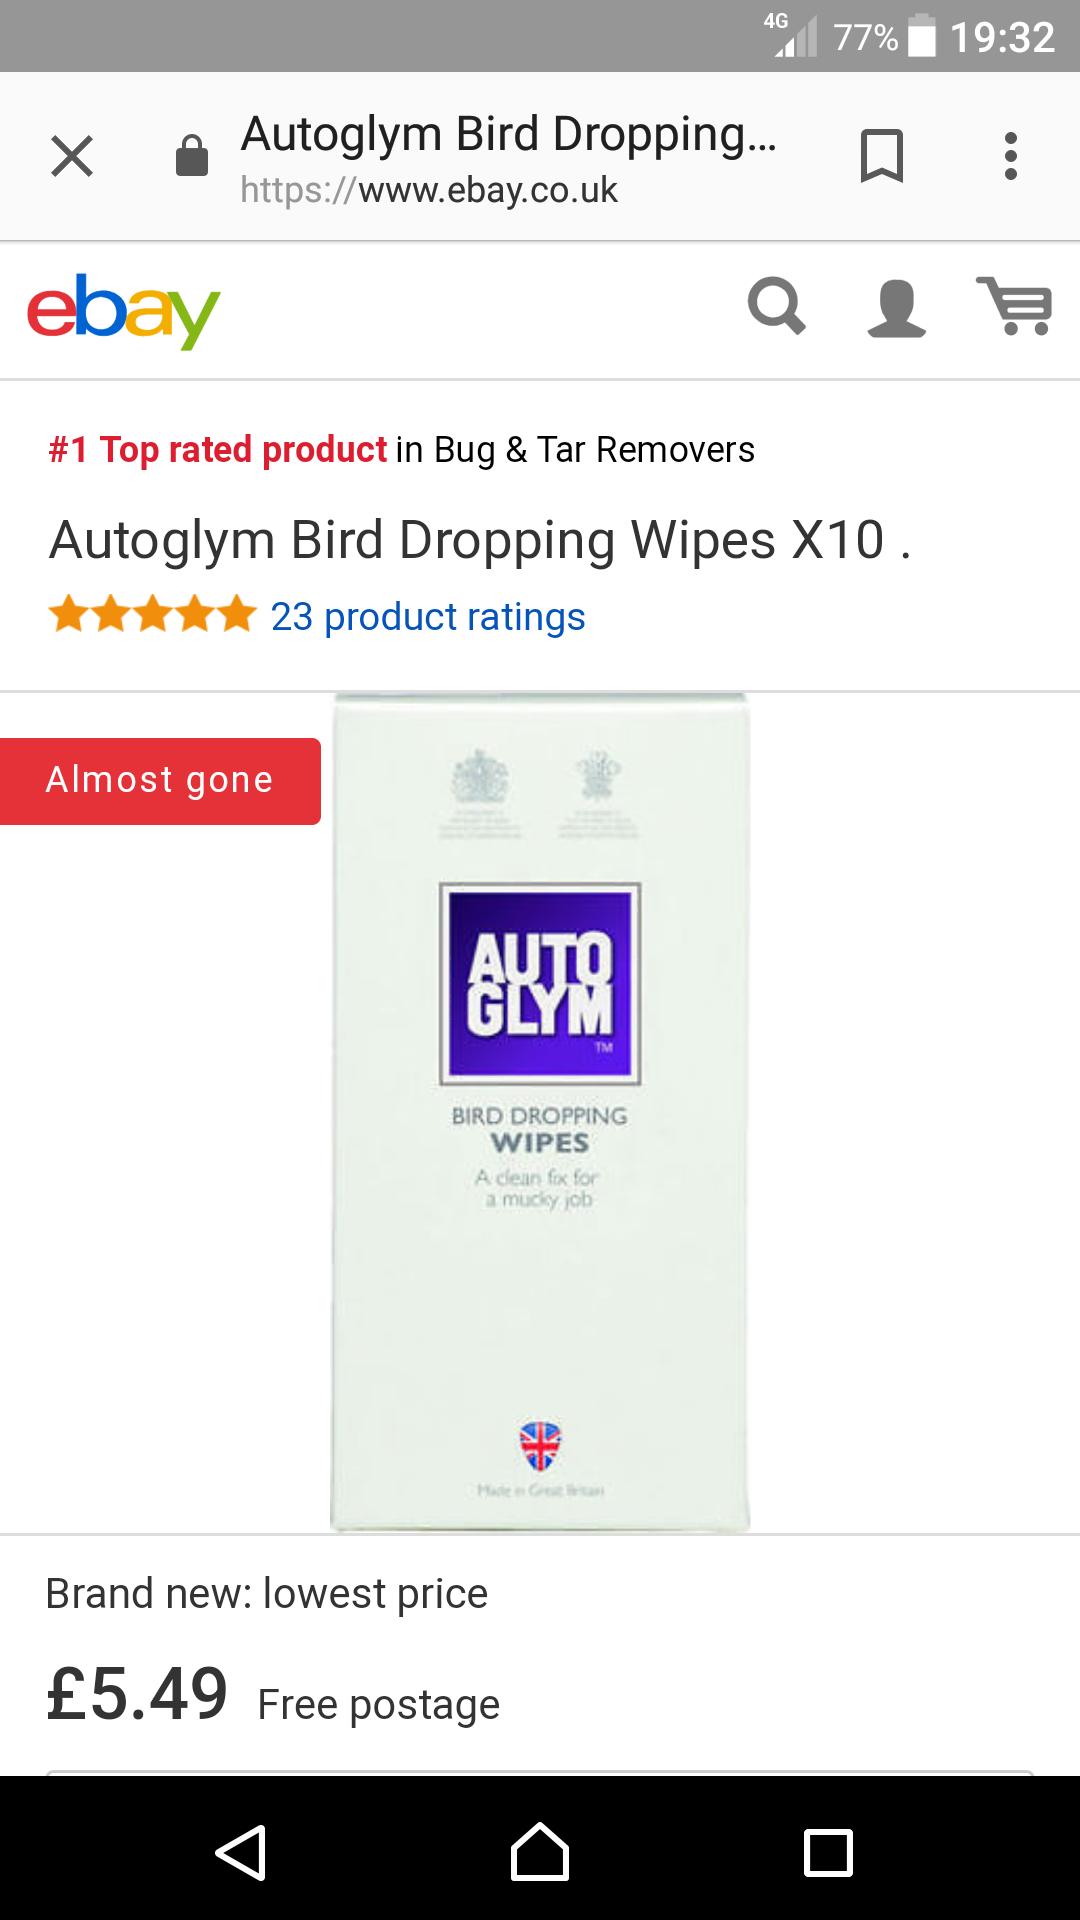 Auto glym Bird dropping wipes - £5.49 @ ebay (seller statuscarcare)